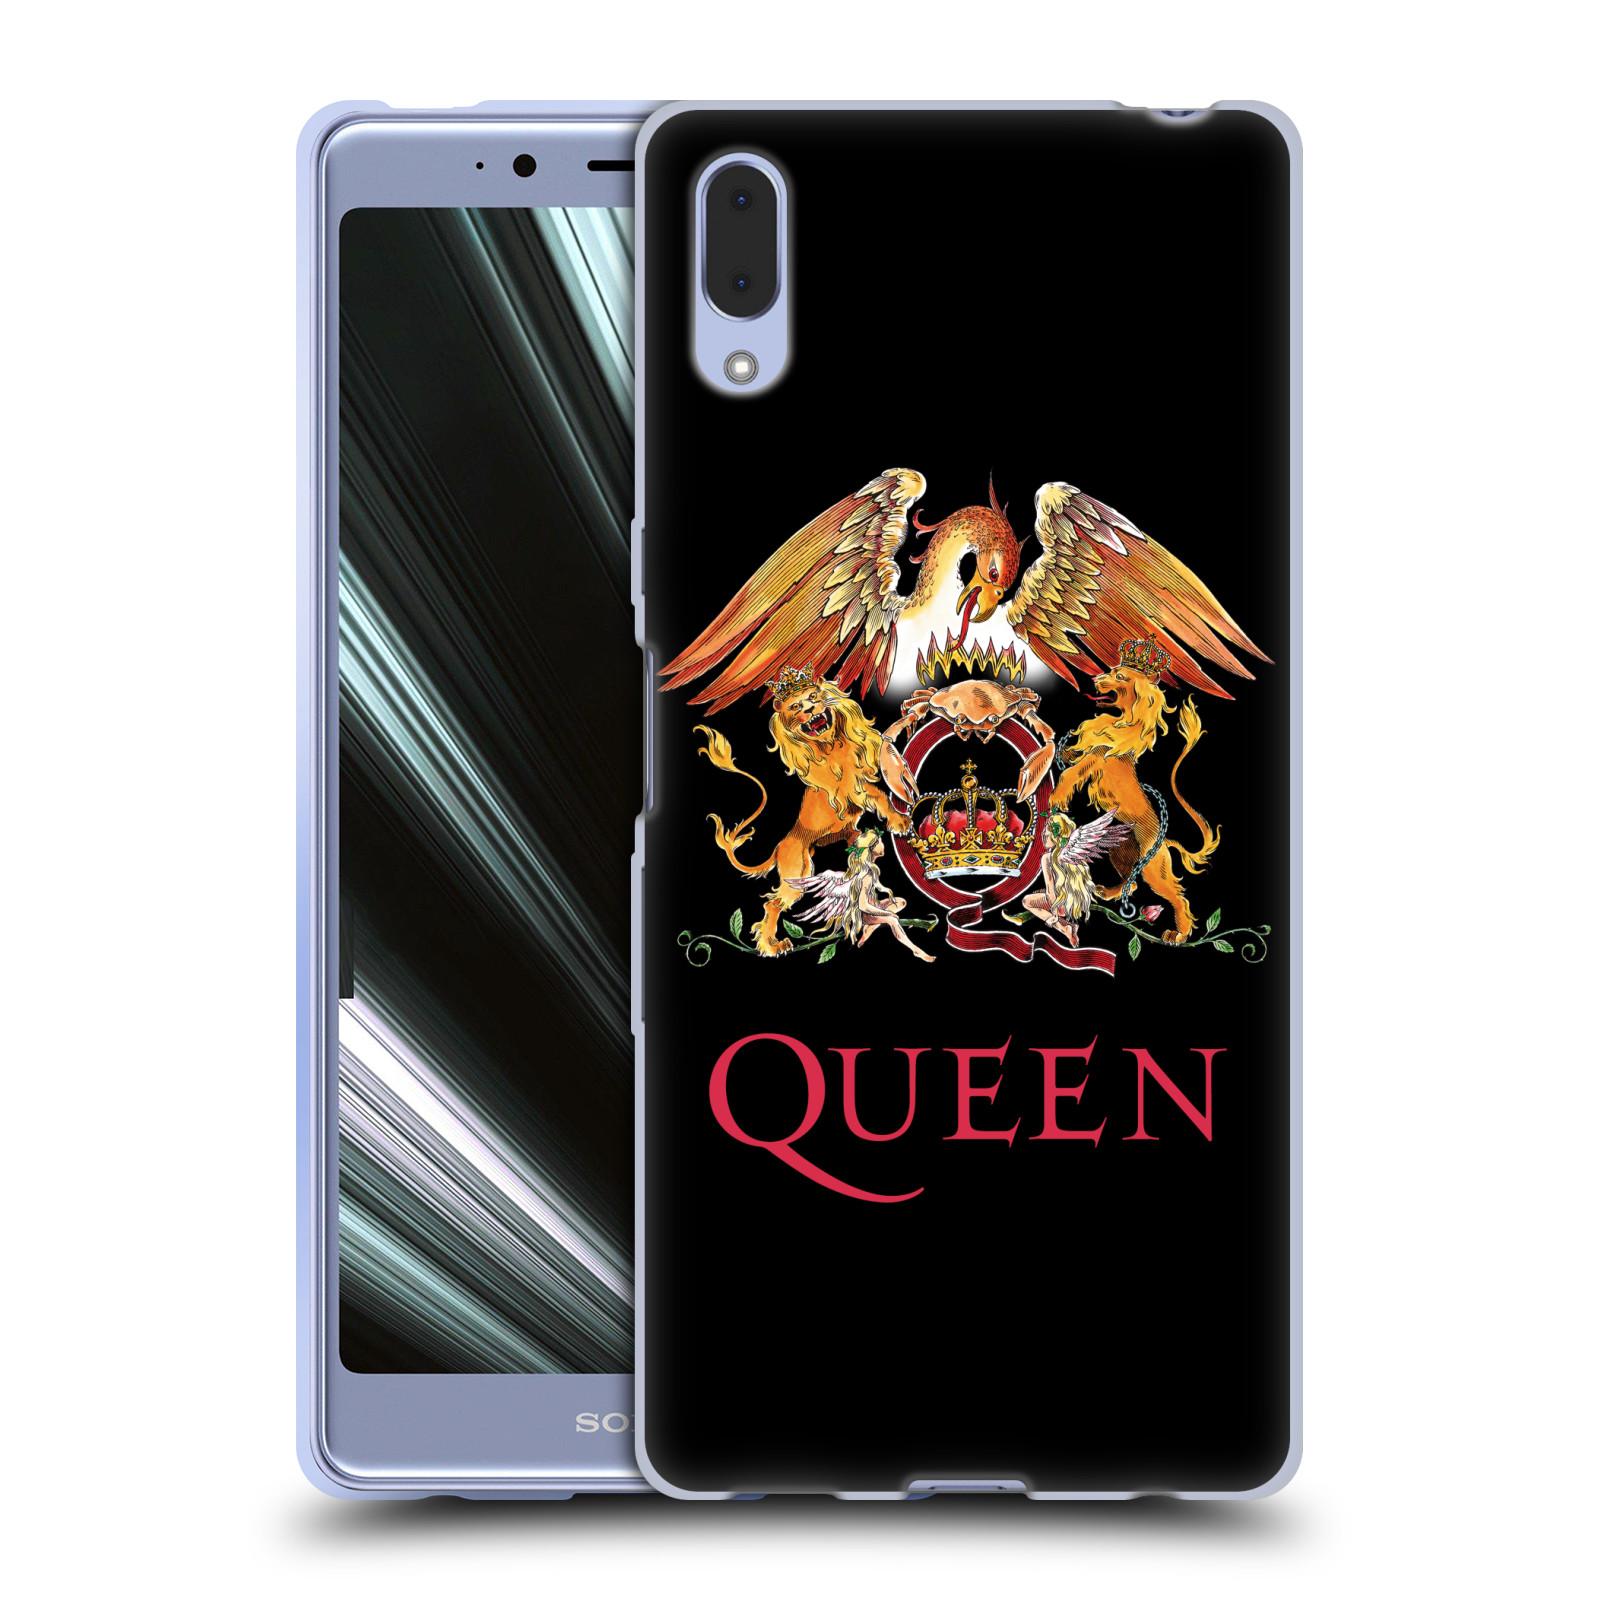 Silikonové pouzdro na mobil Sony Xperia L3 - Head Case - Queen - Logo